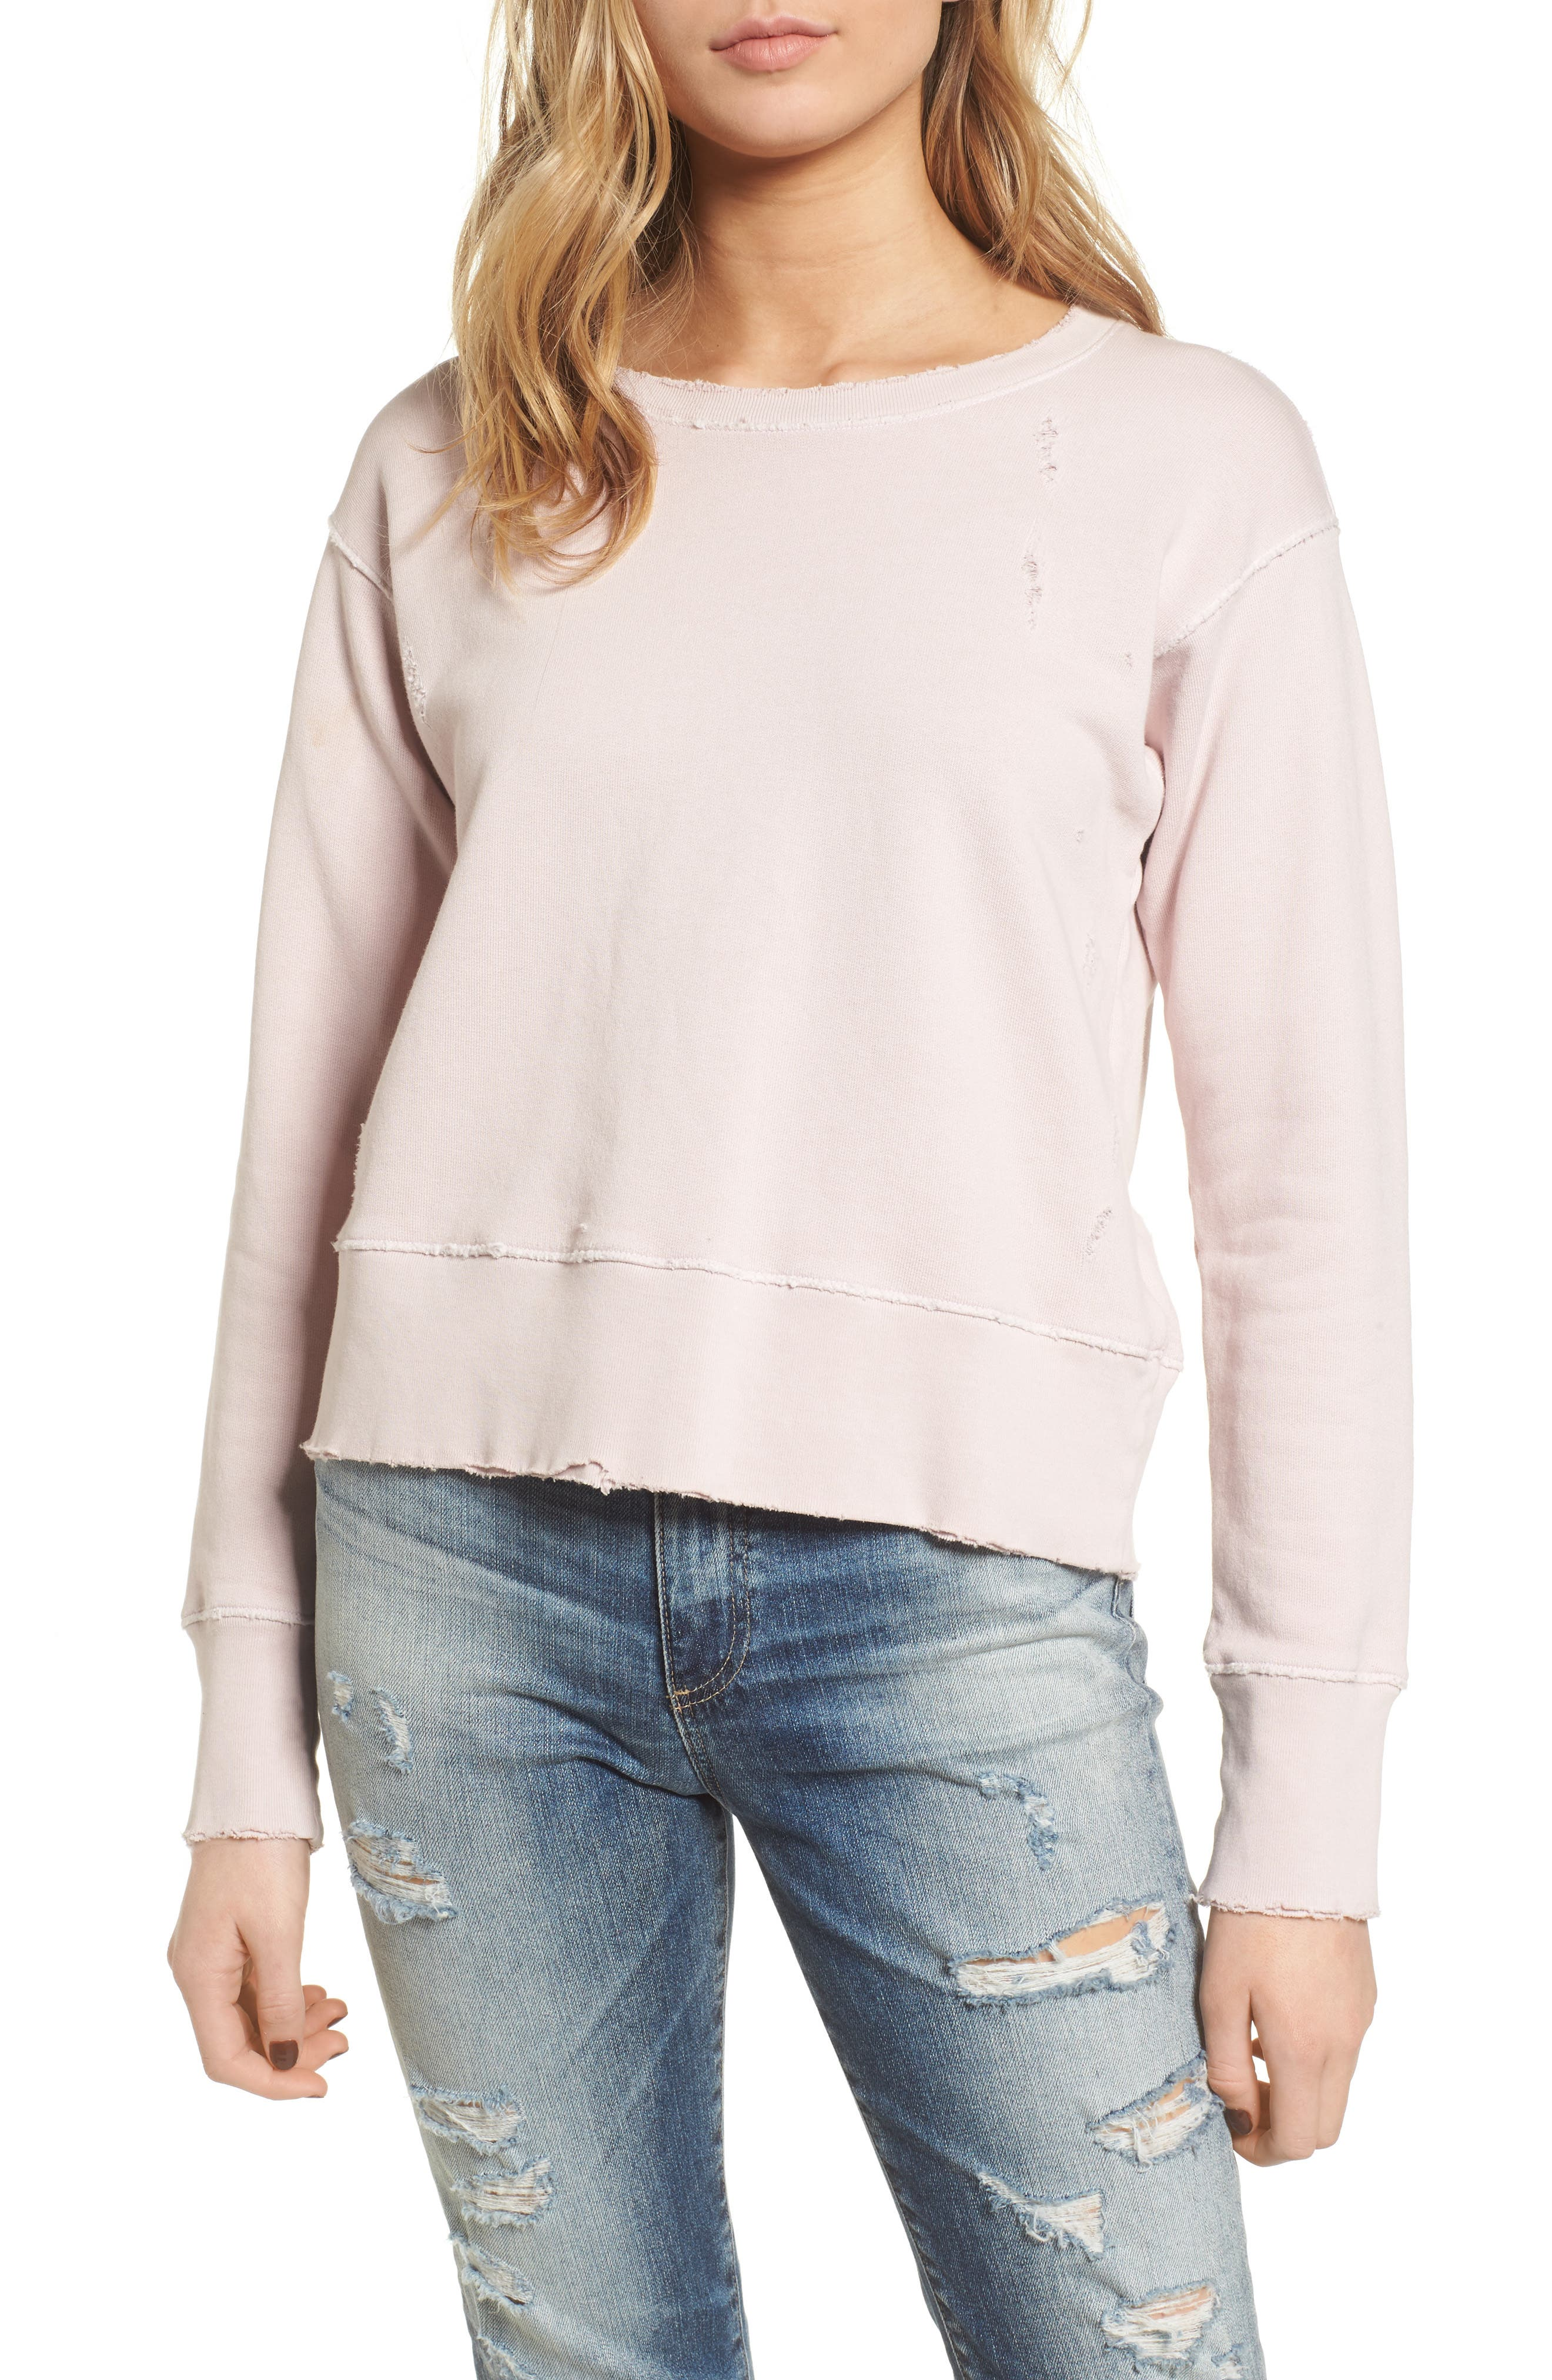 Tee Lab Cotton Sweatshirt,                             Main thumbnail 1, color,